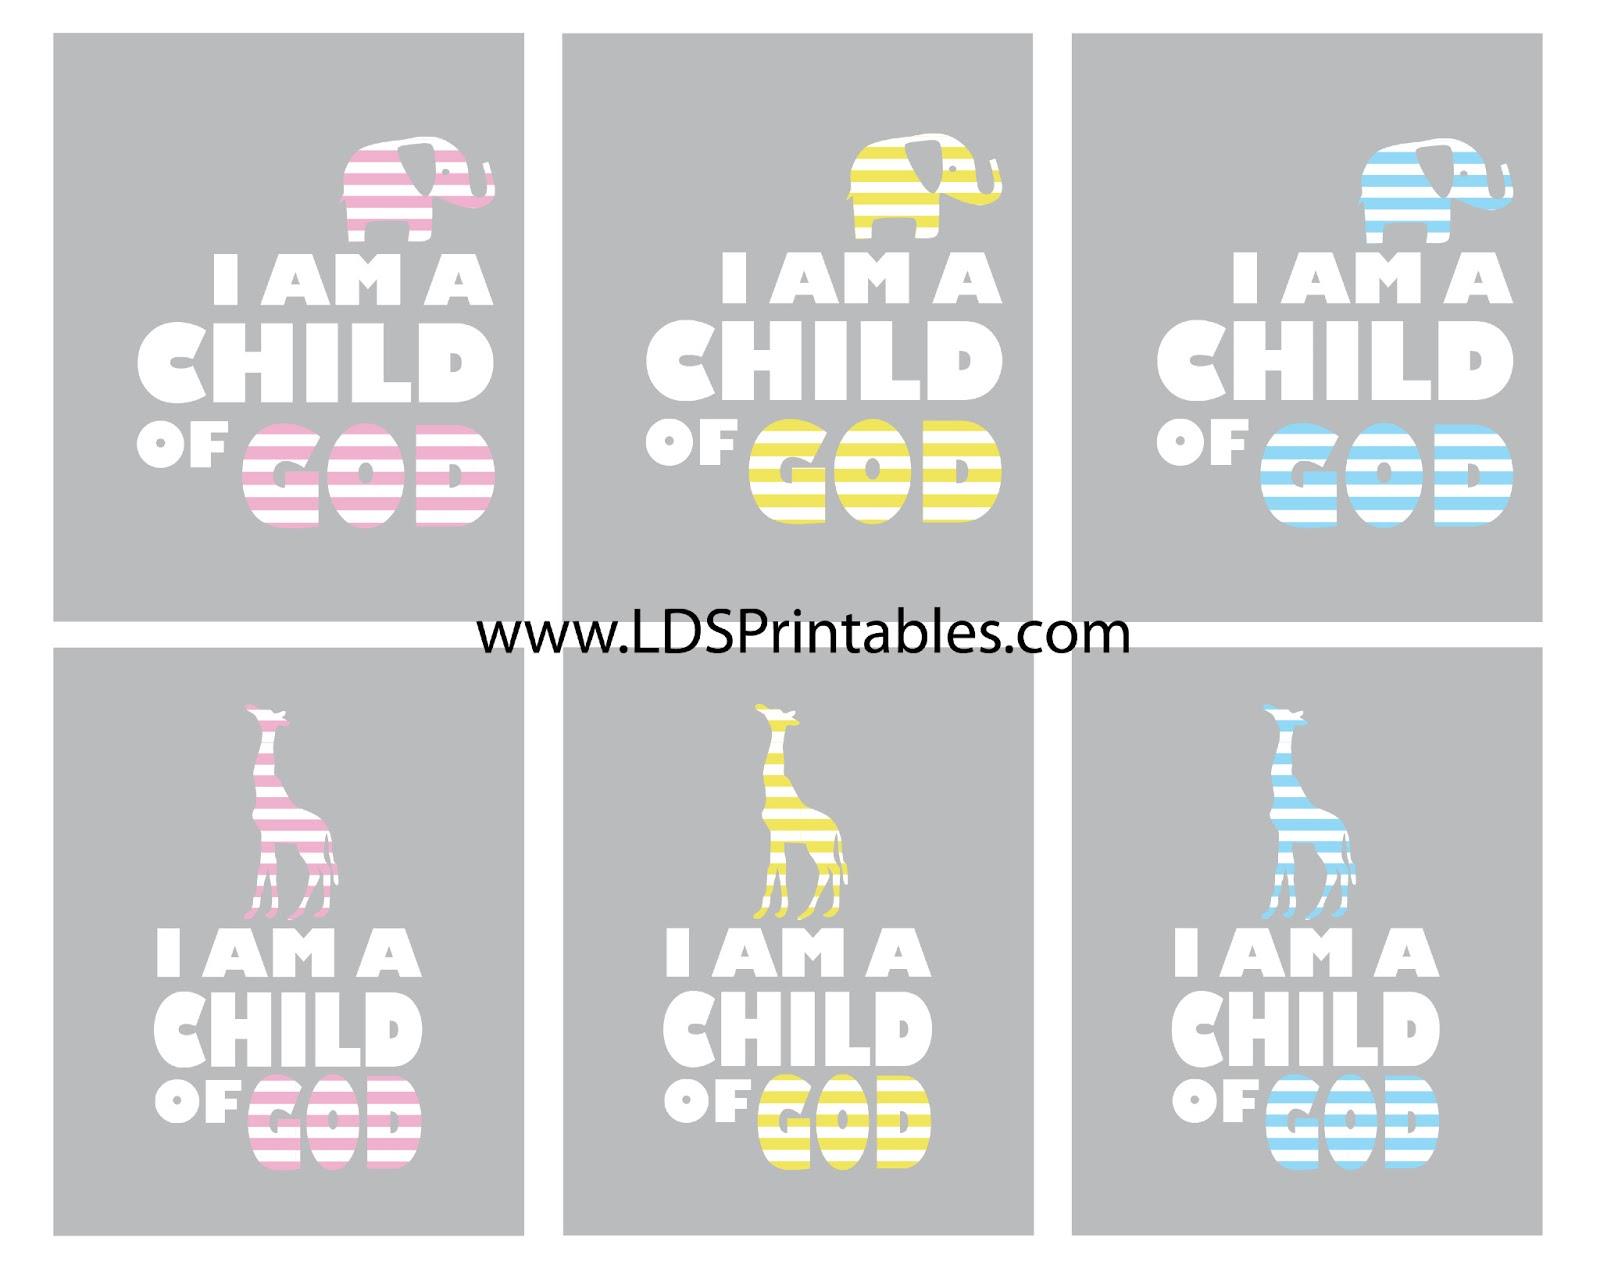 lds printables i am a child of god